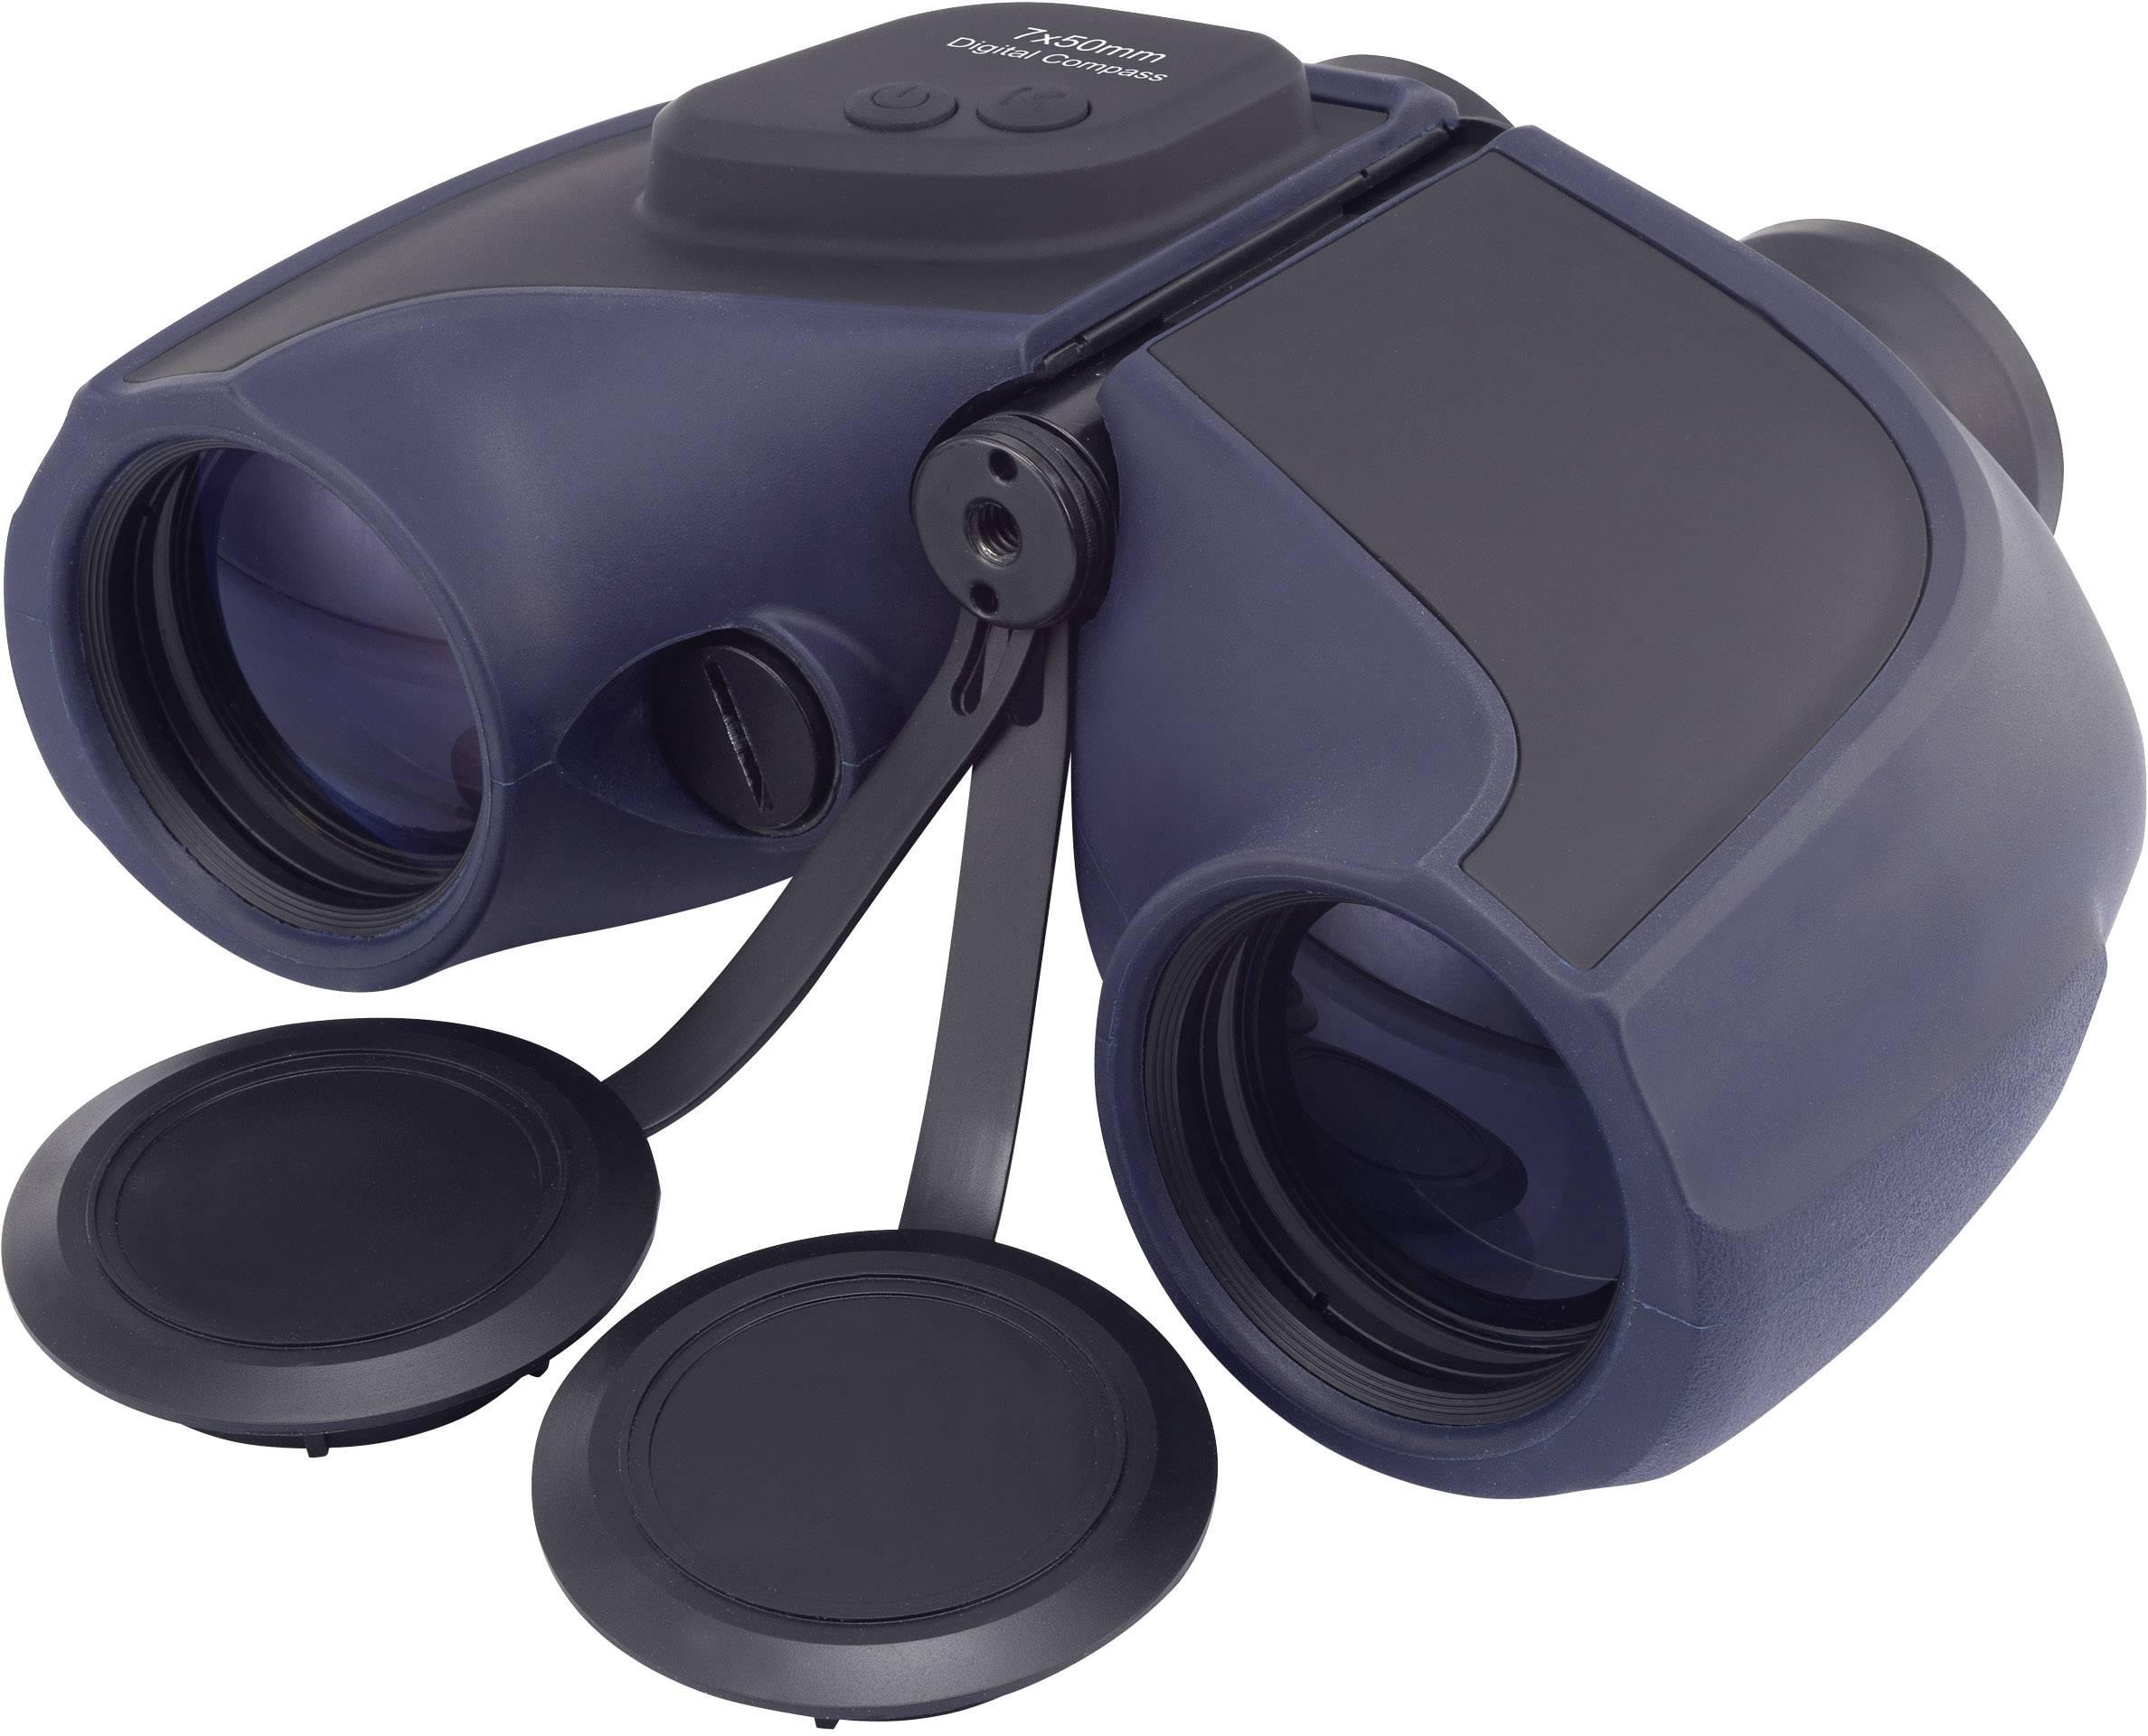 Renkforce marine fernglas binocular mm online bestellen